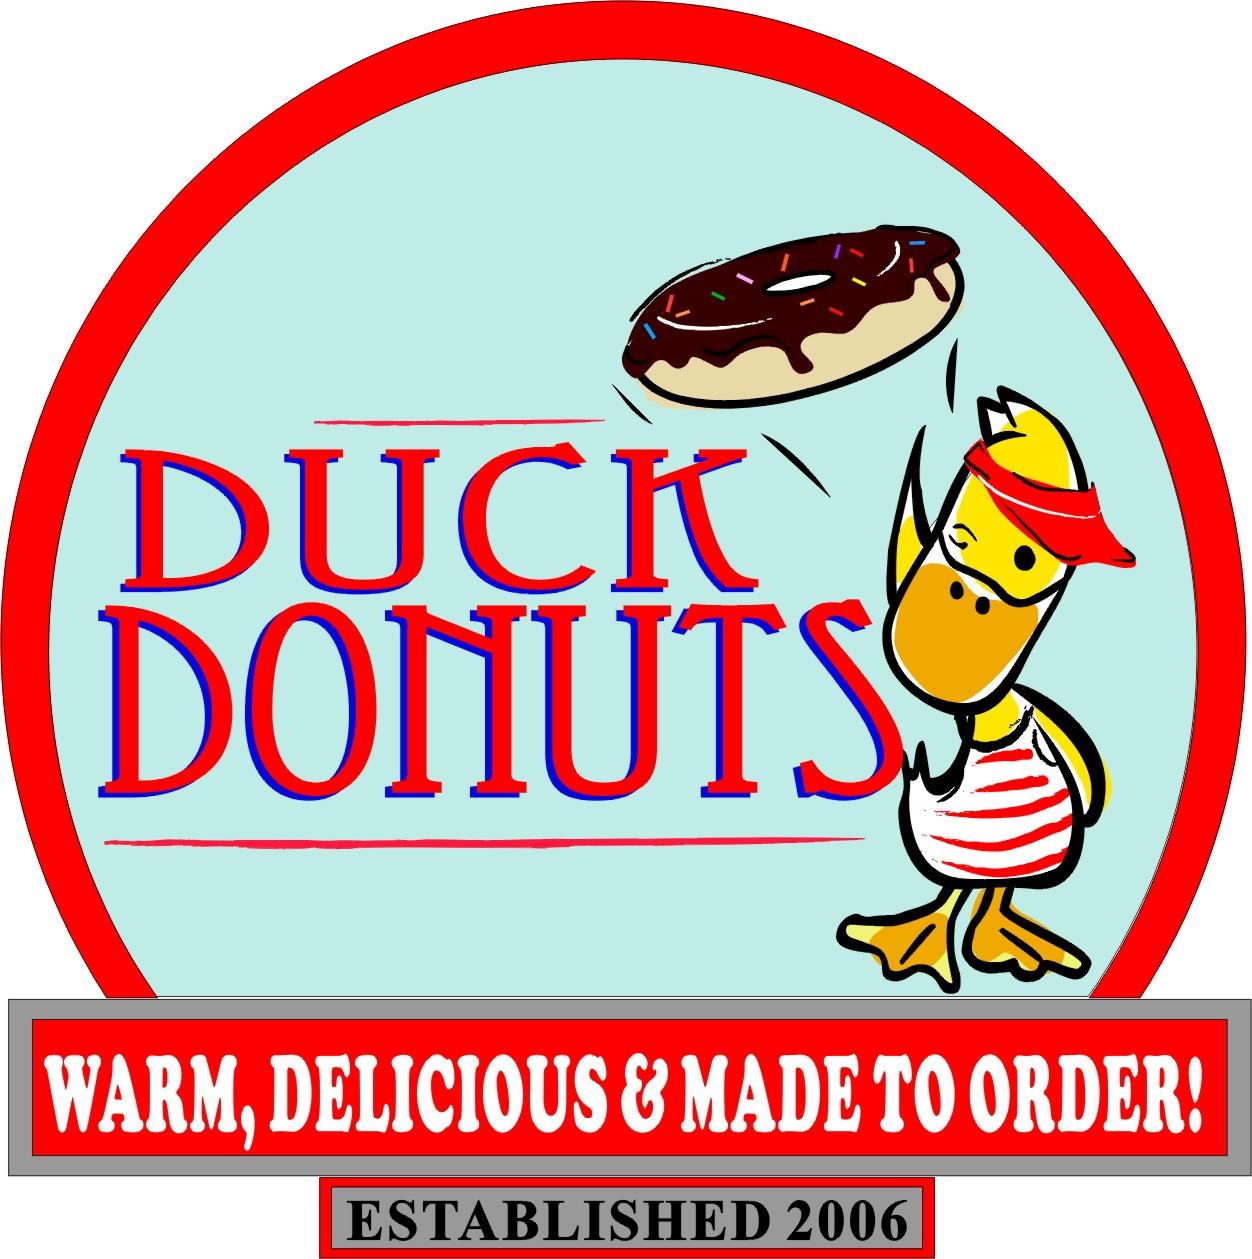 Duck Donuts Restaurant